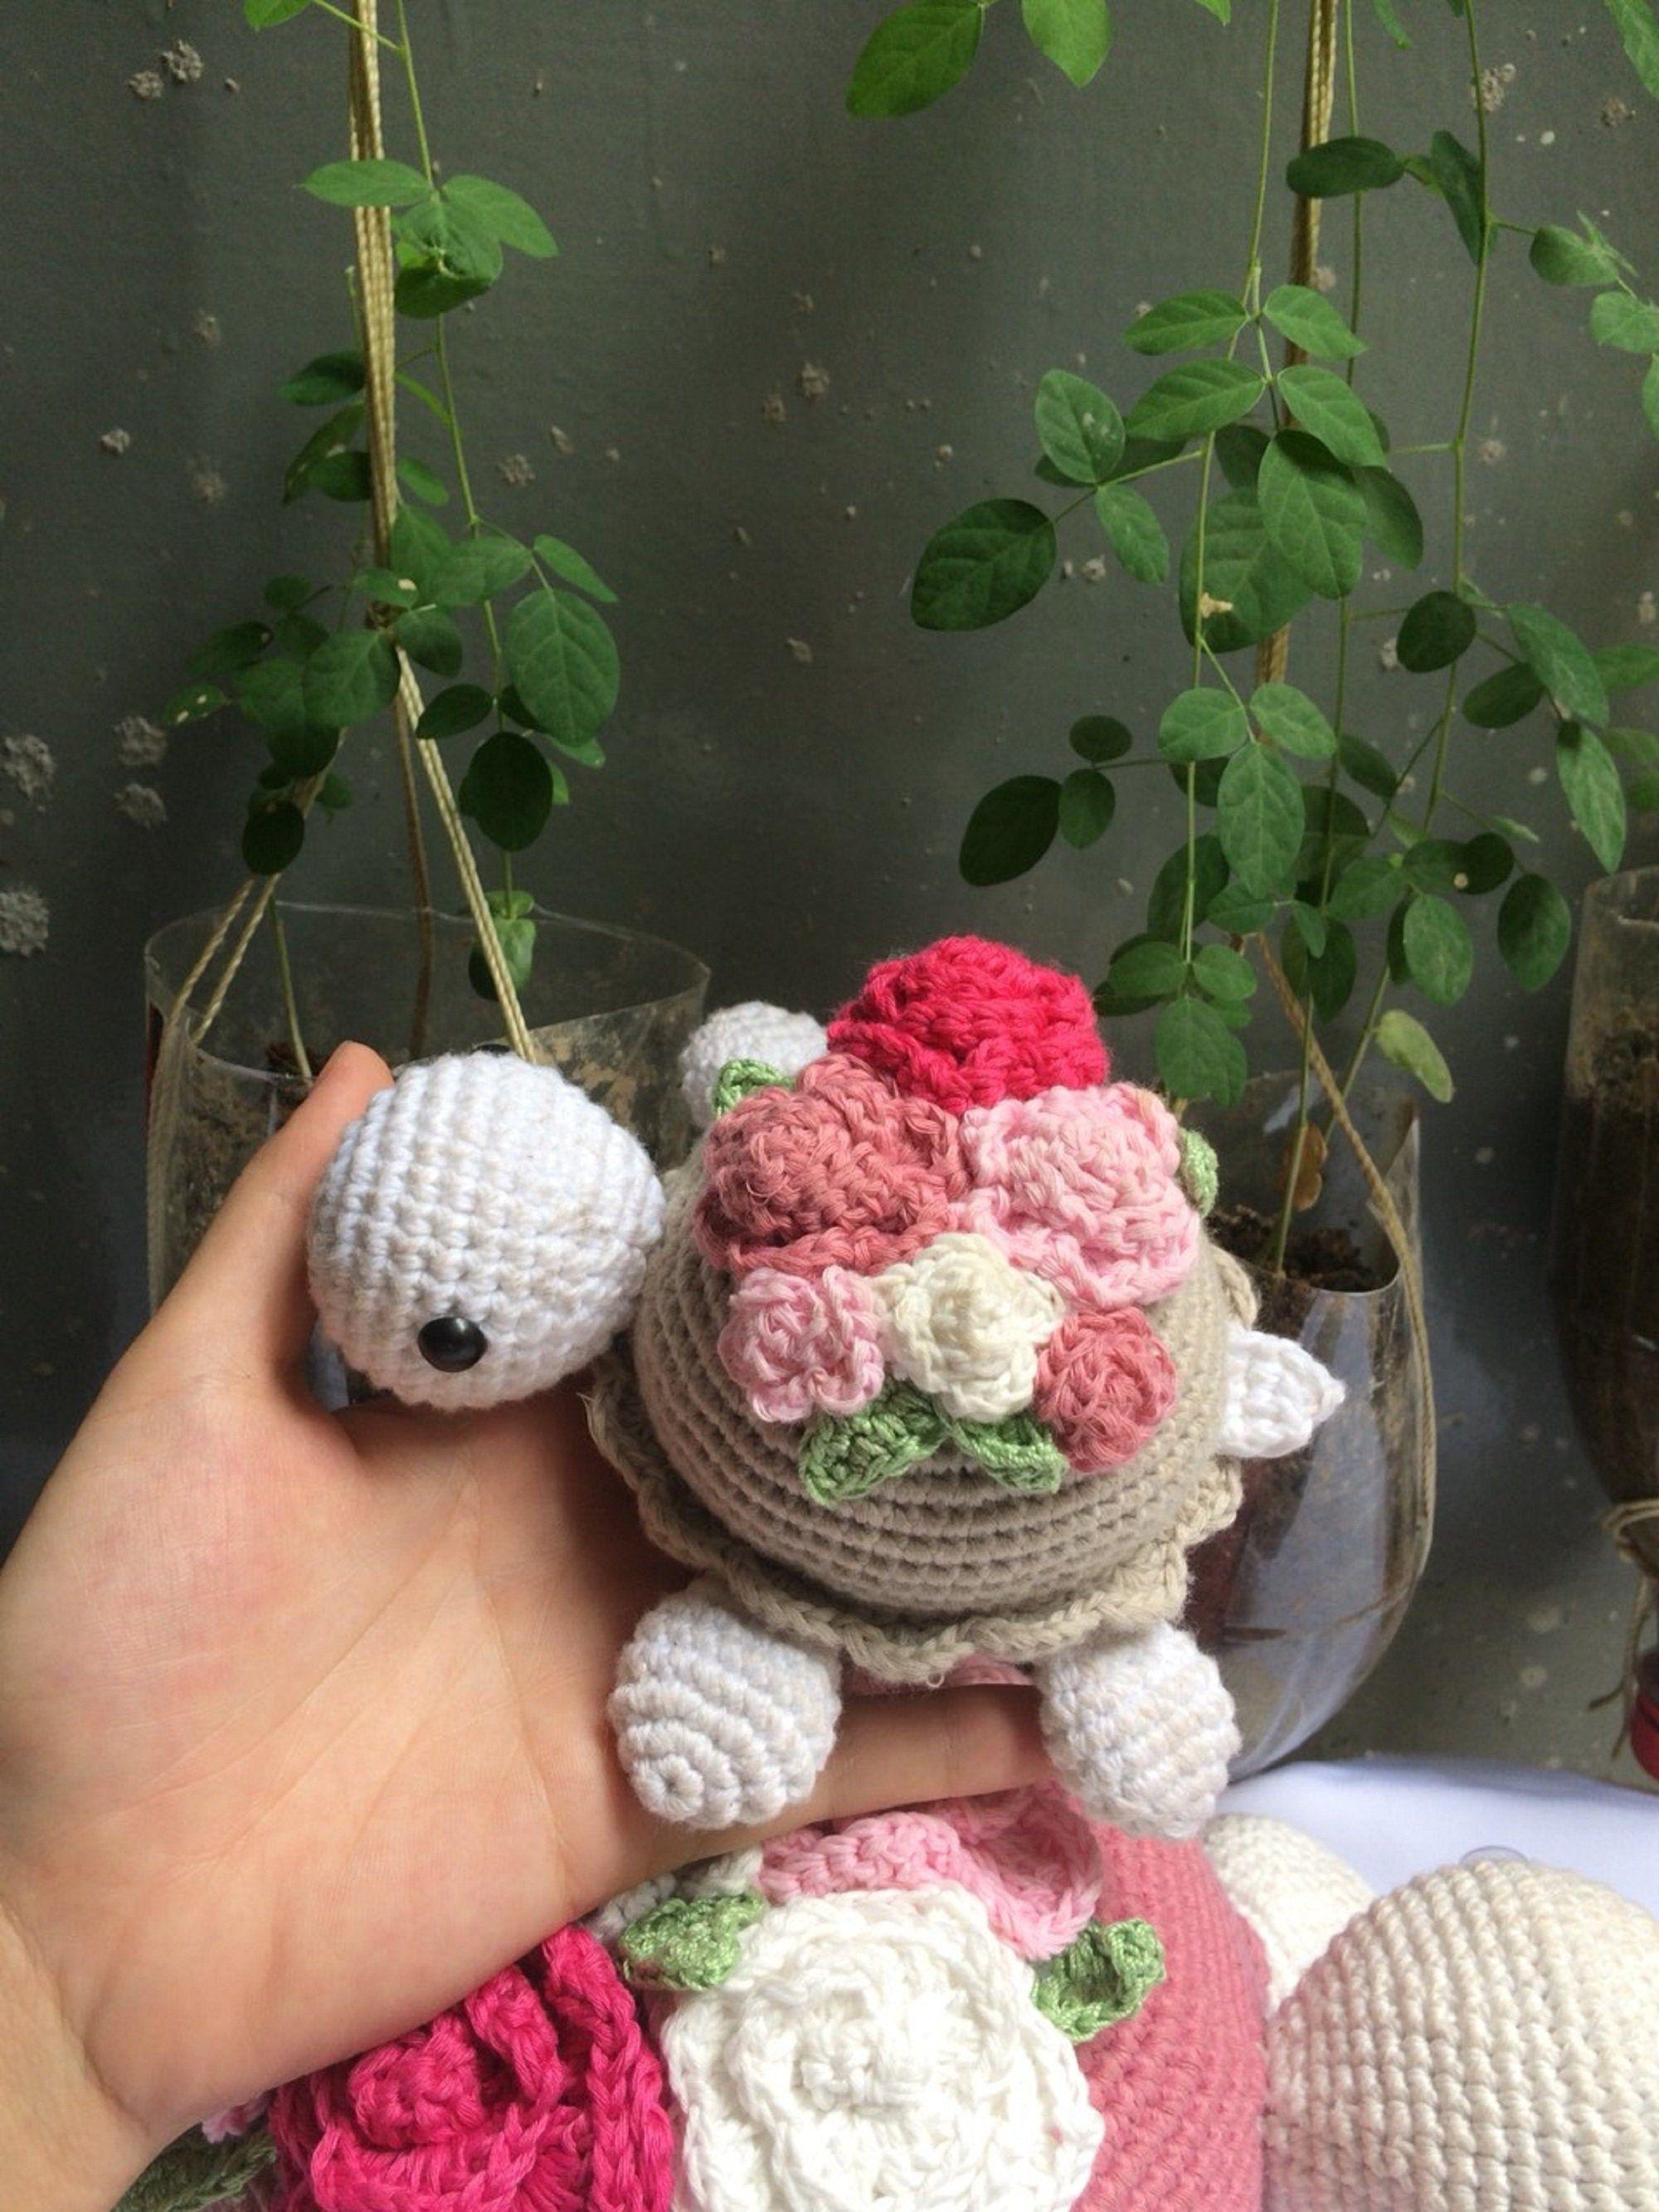 Crochet turtle pattern, tortoise, sea creature, Crochet Sea Turtle Turtle Crochet Pattern, Turtle Amigurumi, Crochet Animals, Crochet Toy #crochetturtles